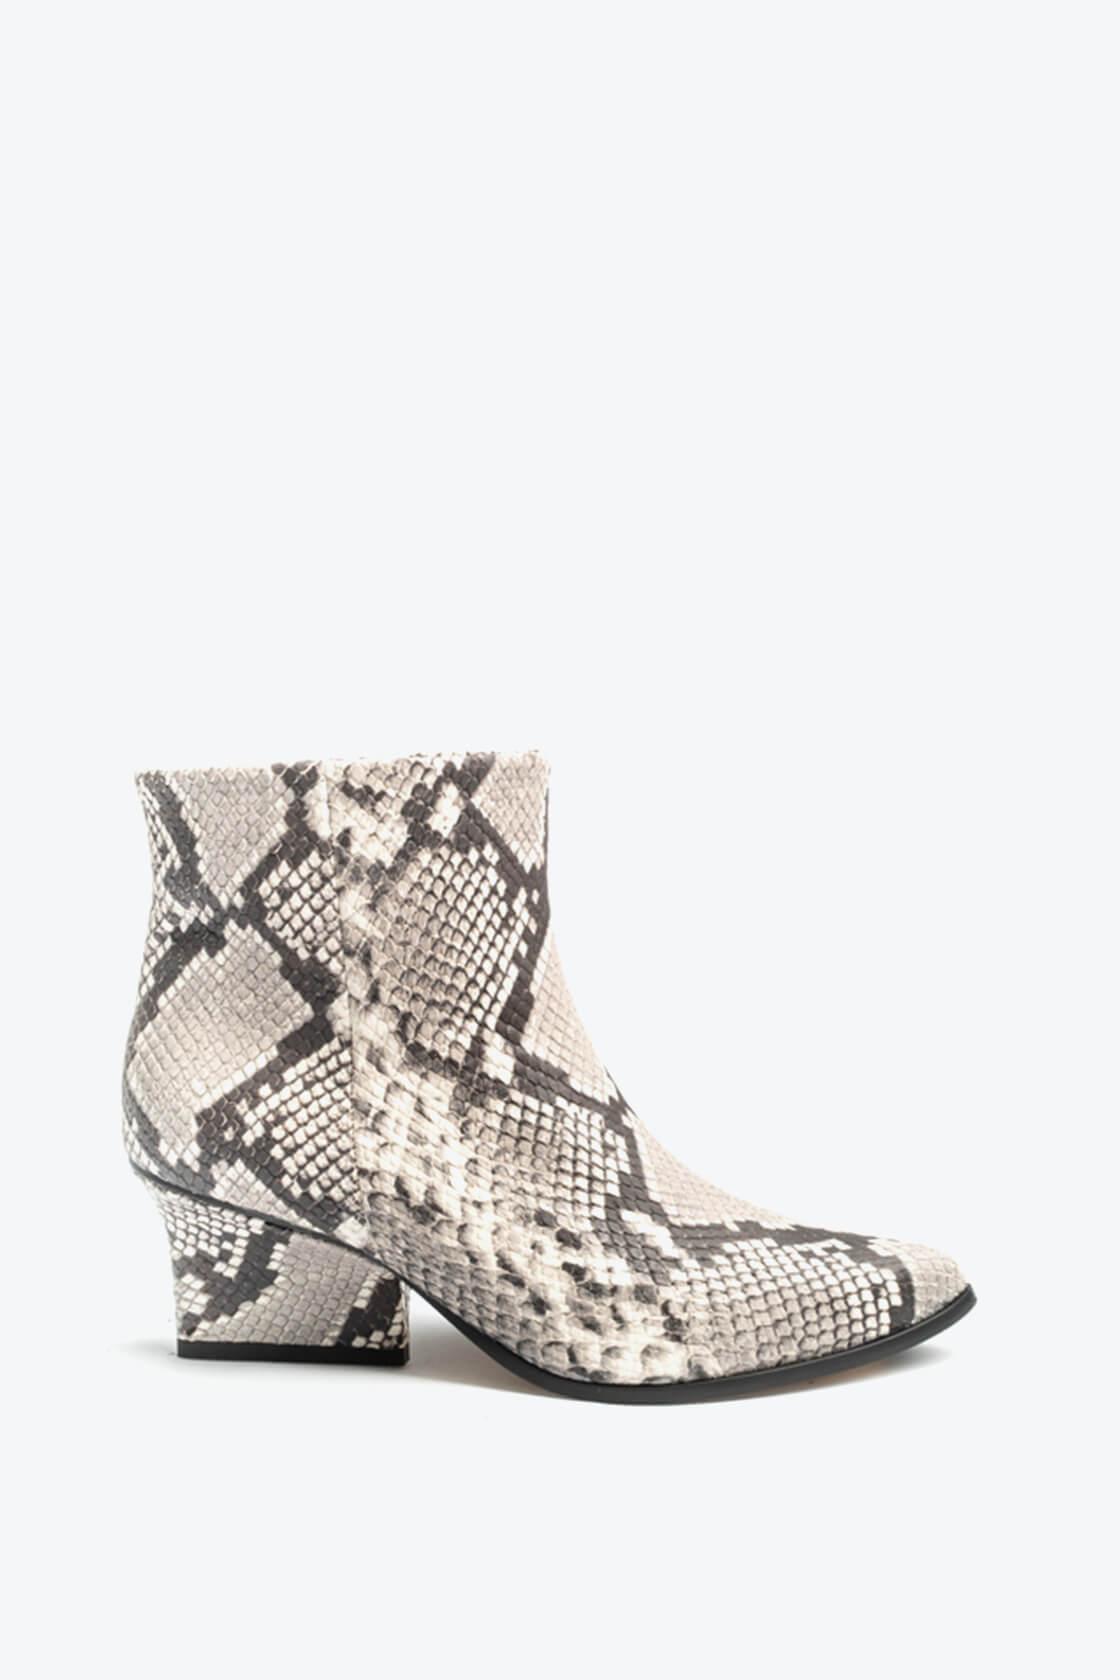 EJK0000039 Denis ankle boots smog python 1